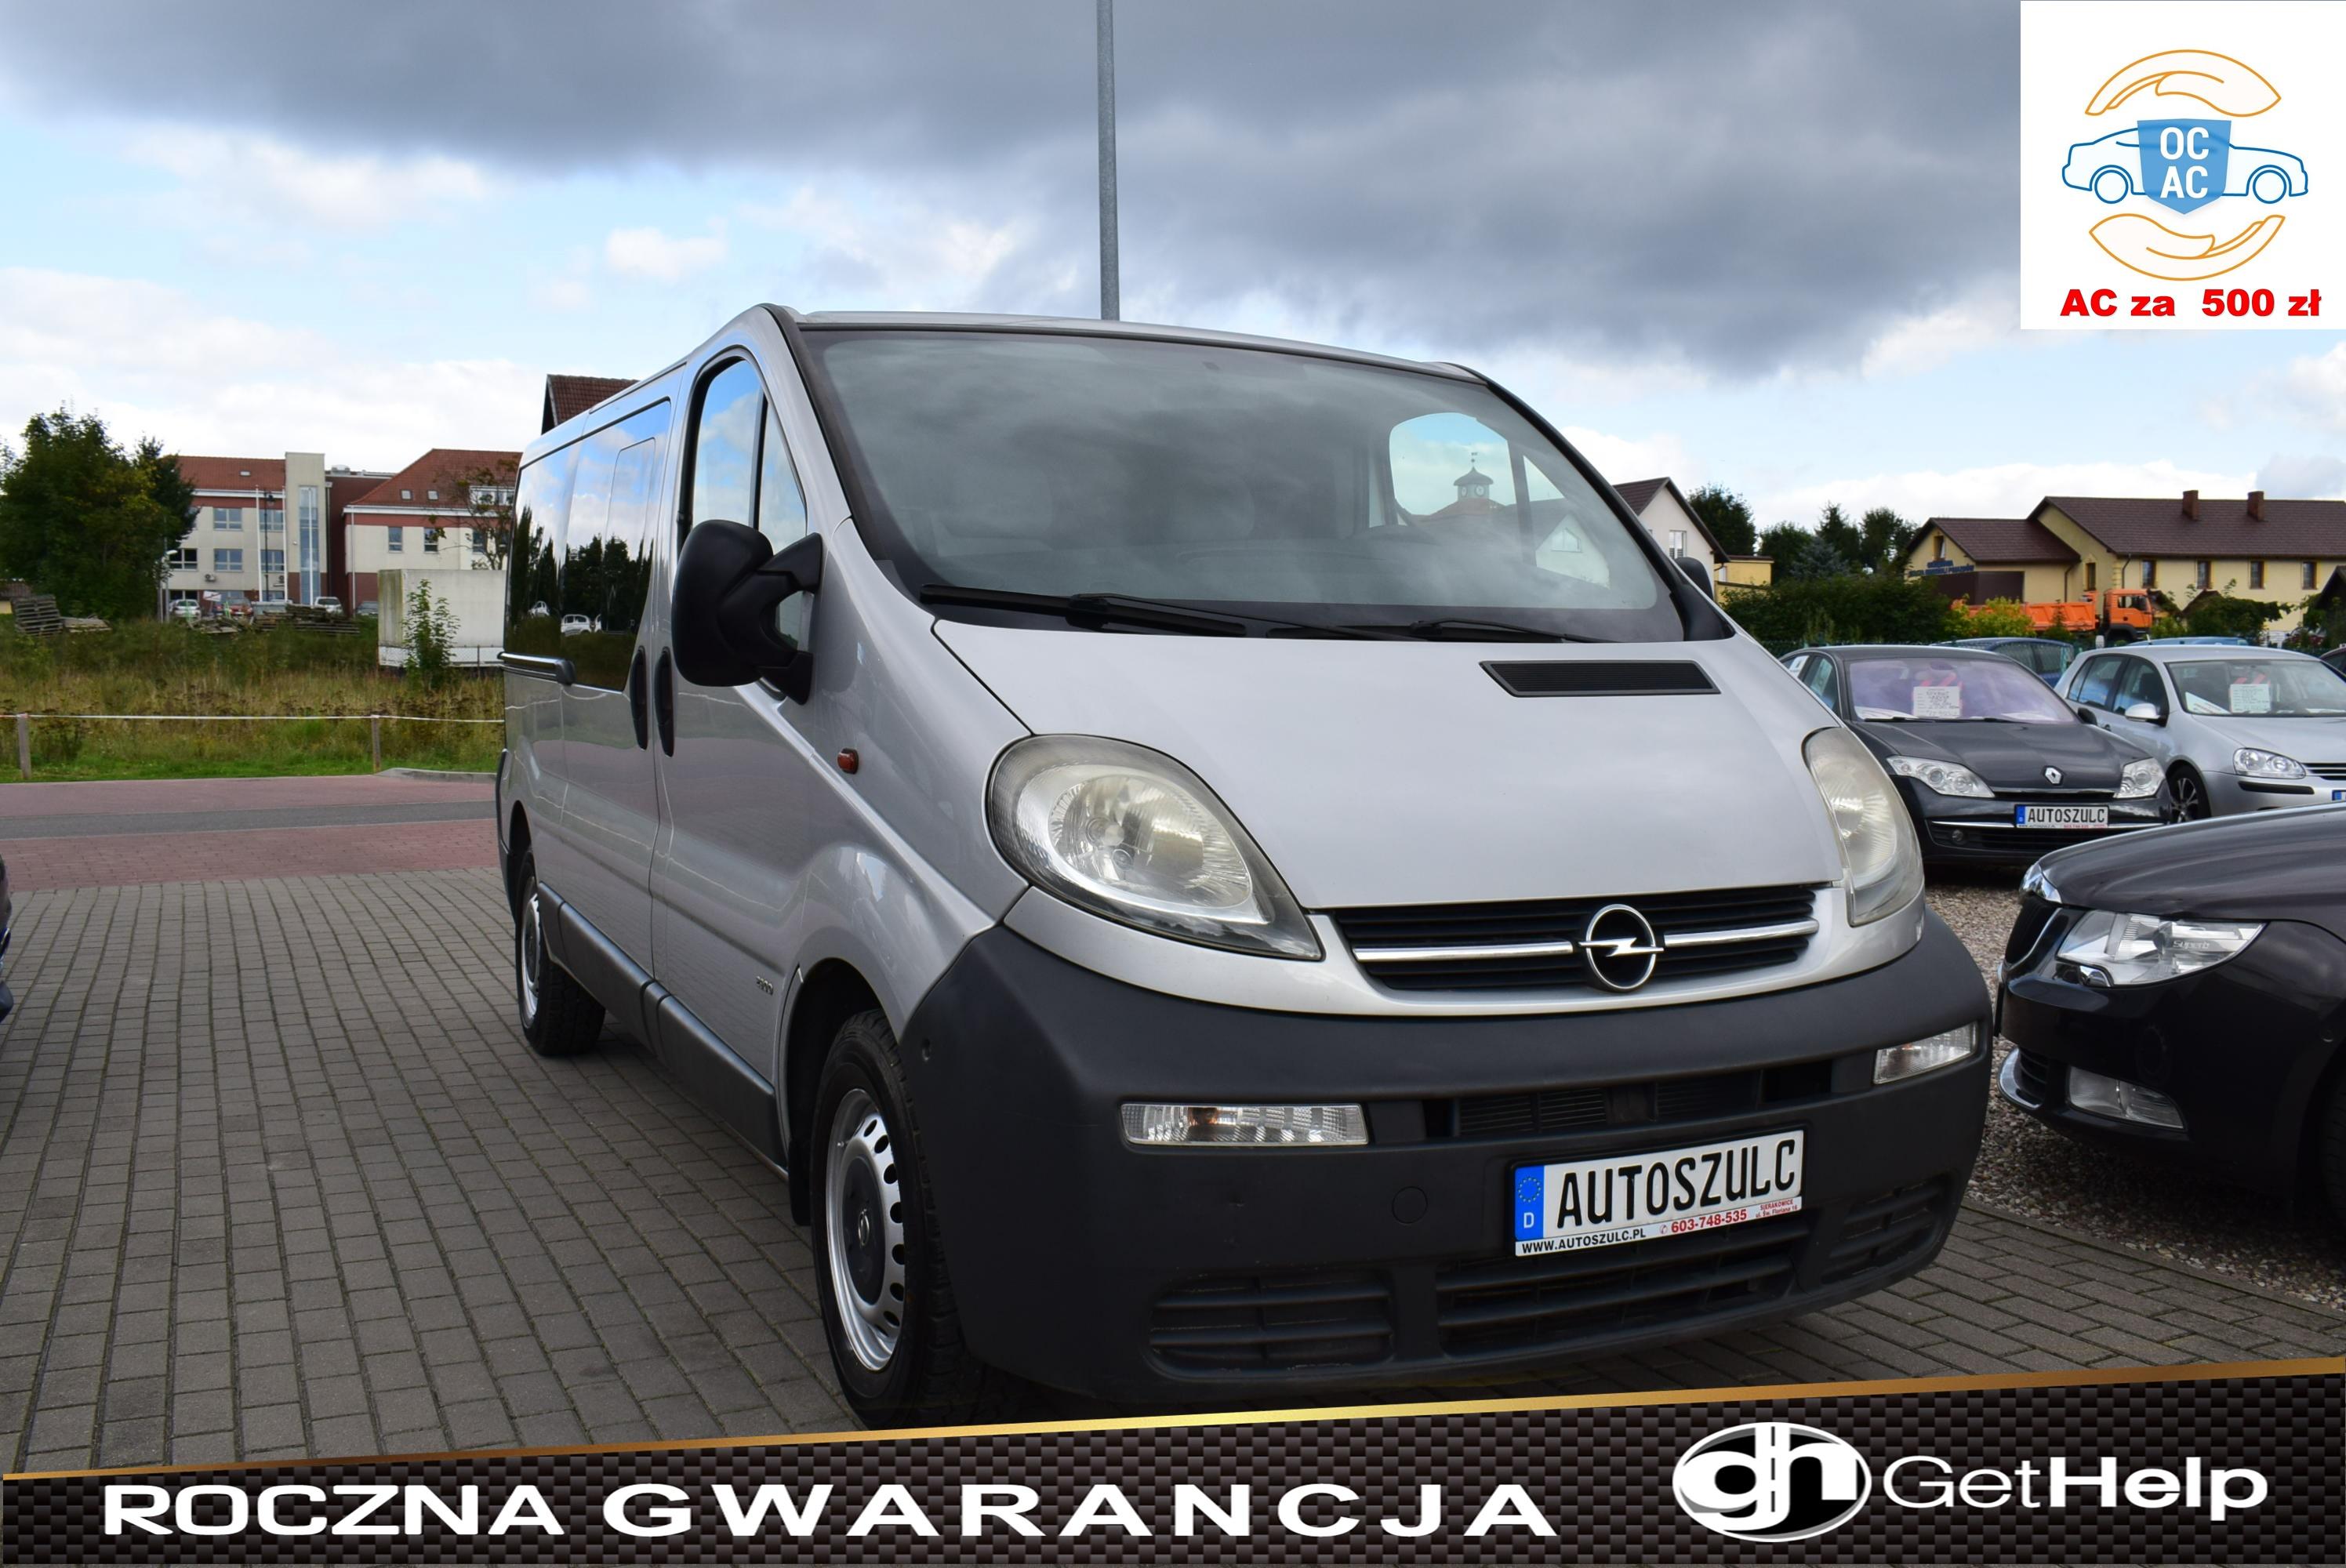 Opel Vivaro 1.9 CDTI 101 PS, LONG, KLIMA, HAK, 9-Osobowy, Zadbany, Rok Gwarancji